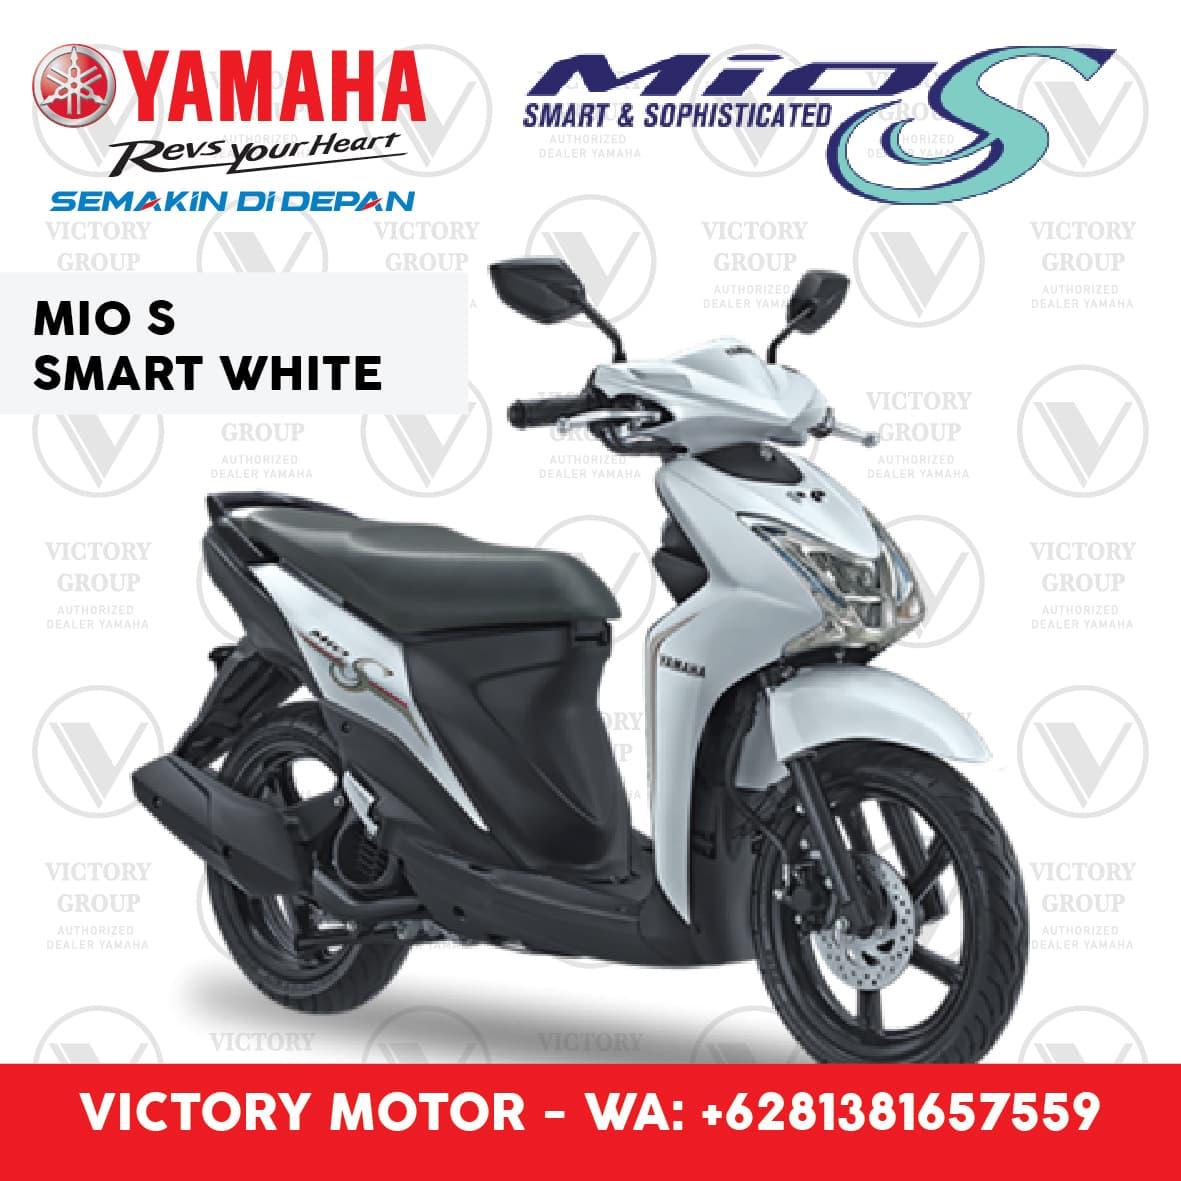 Jual Yamaha Mio S White Putih Jkt Bntn Victory Motor Xabre Sepeda Otr Jakarta Ampamp Tangerang Tokopedia